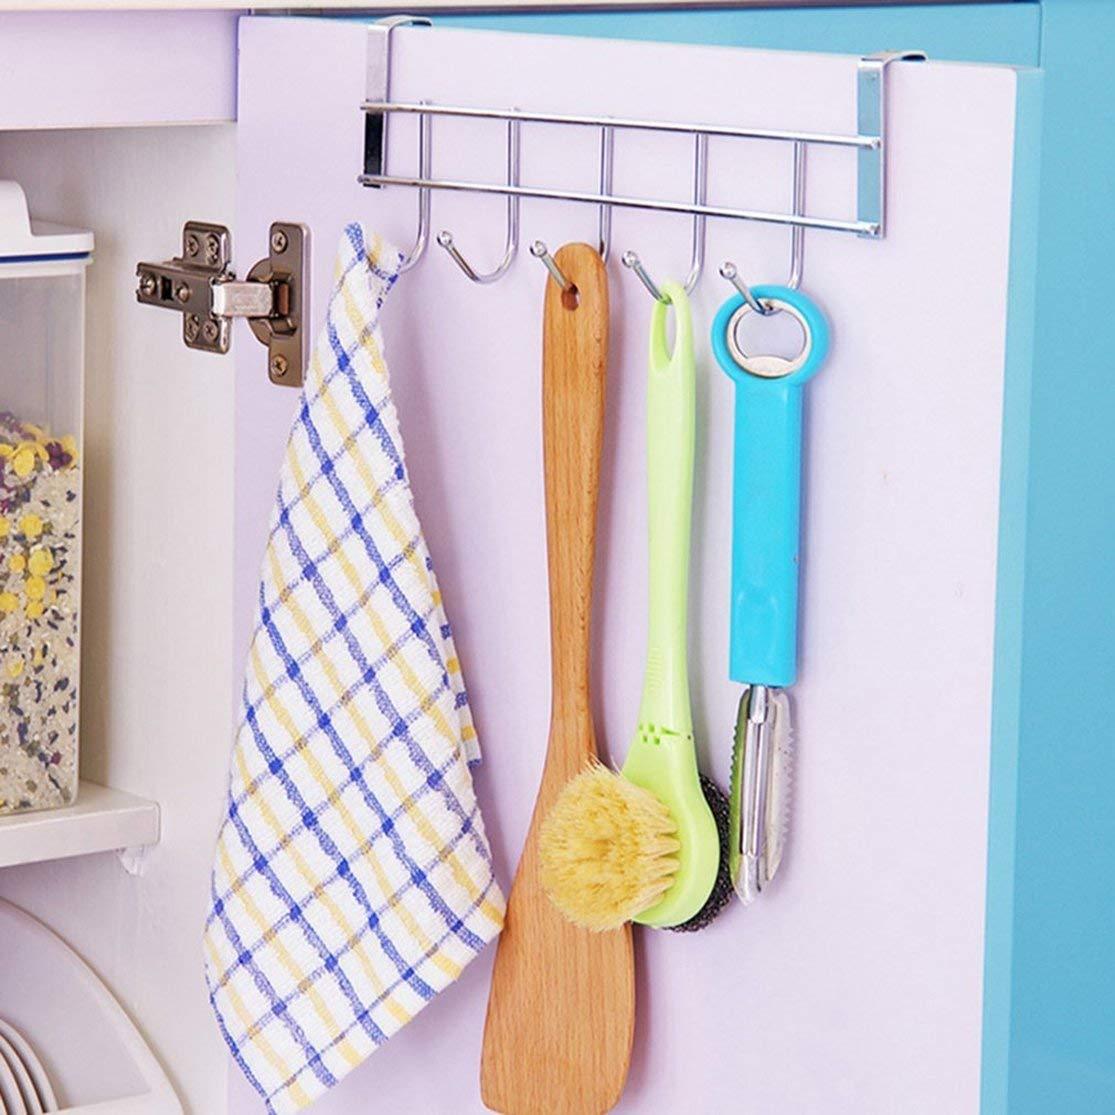 LouiseEvel215 Eco-Friendly Silver Metal Over Door Home Bathroom Kitchen Coat Towel Hanger Rack Holder Shelf 5 Hooks Hooks /& Rails